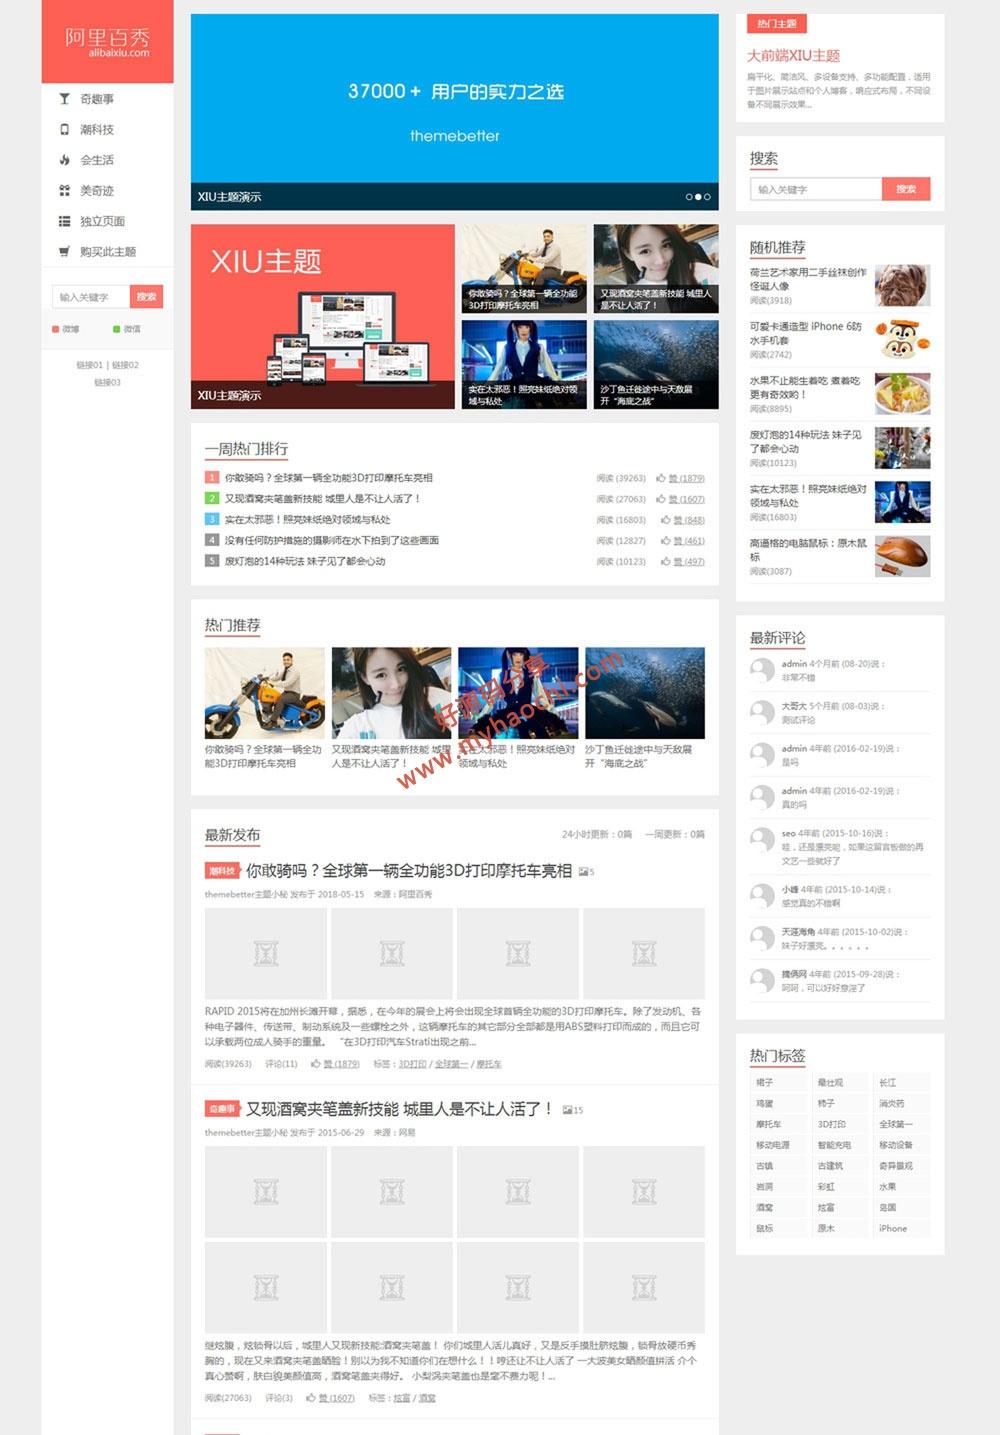 wordpress主题 阿里百秀XIU v7.7版本插图